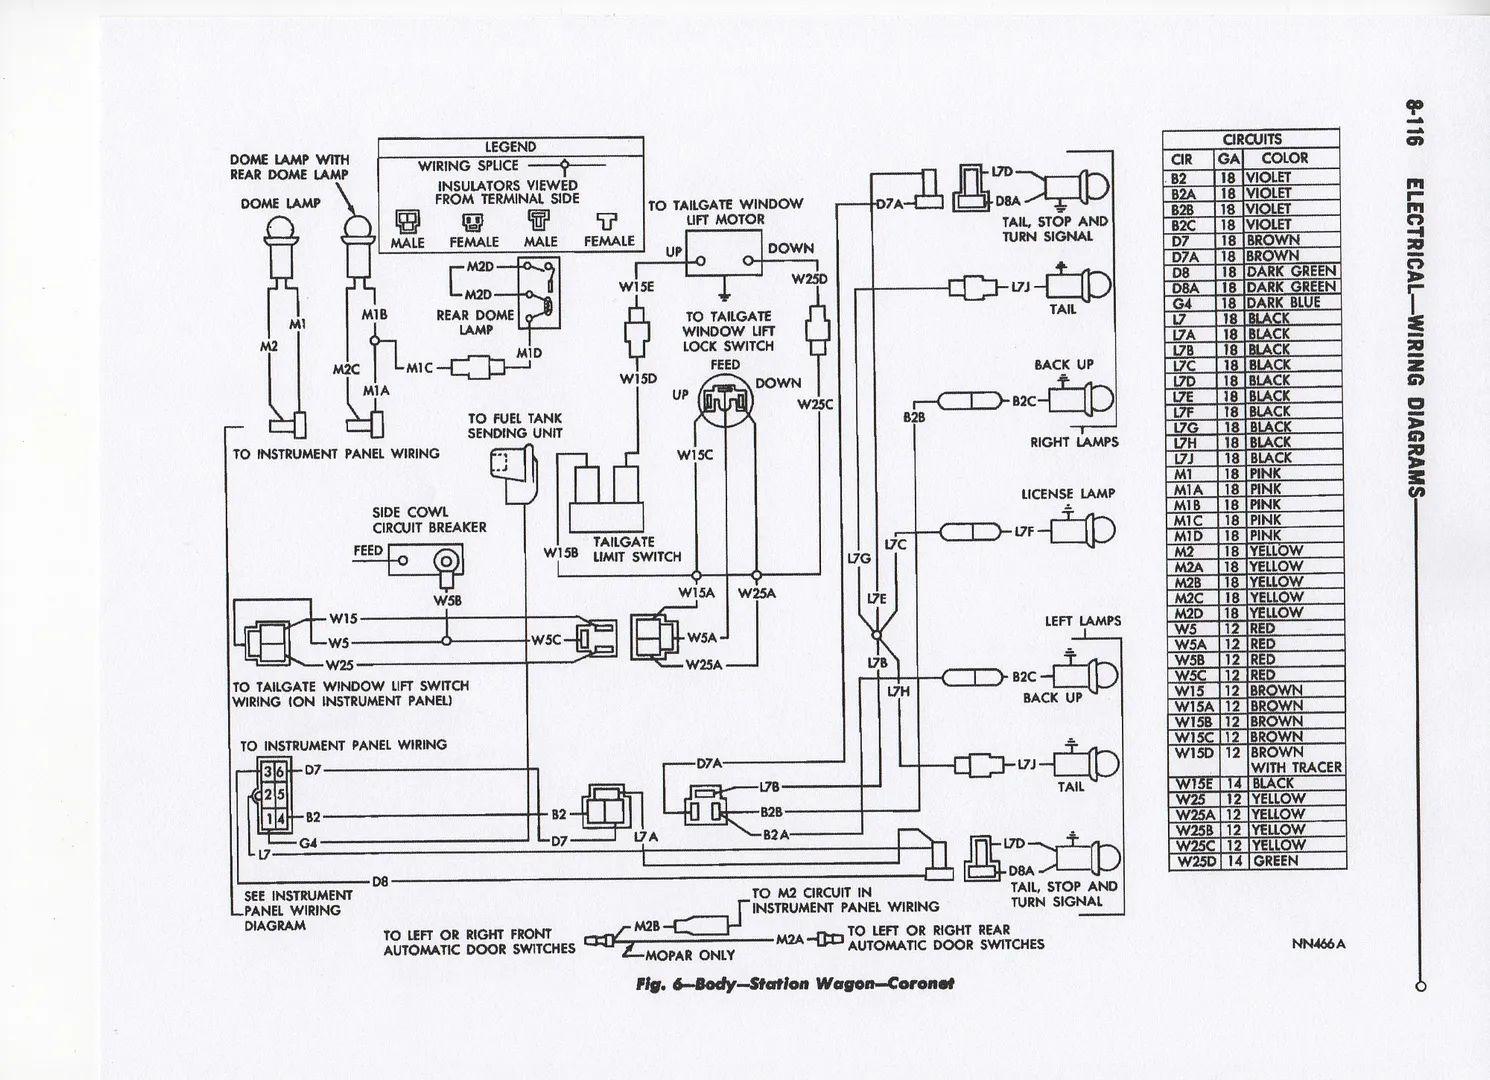 67 coronet wiring diagram